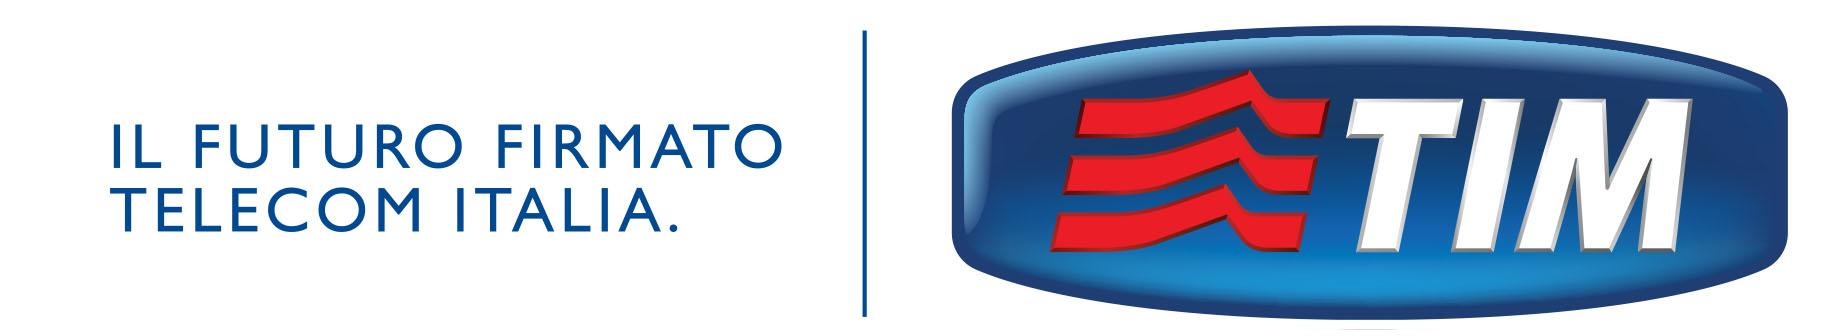 acceleratori web telecom